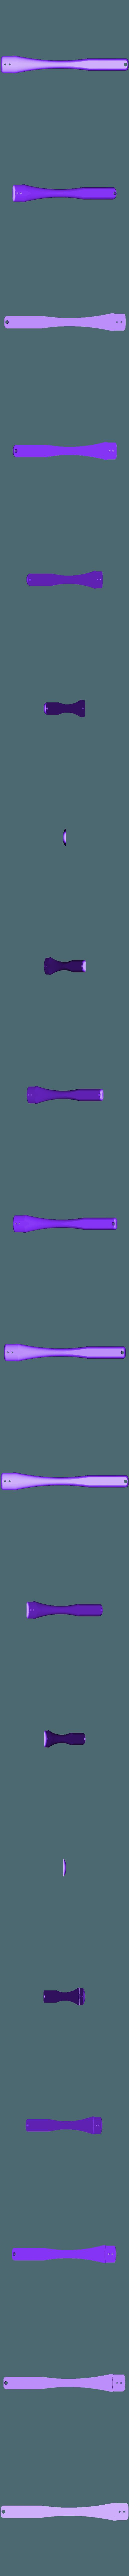 LlamaBottomFlipped.stl Télécharger fichier STL gratuit 3DprintingLlamaSwatterLlamaSwatter • Design pour impression 3D, Thomllama